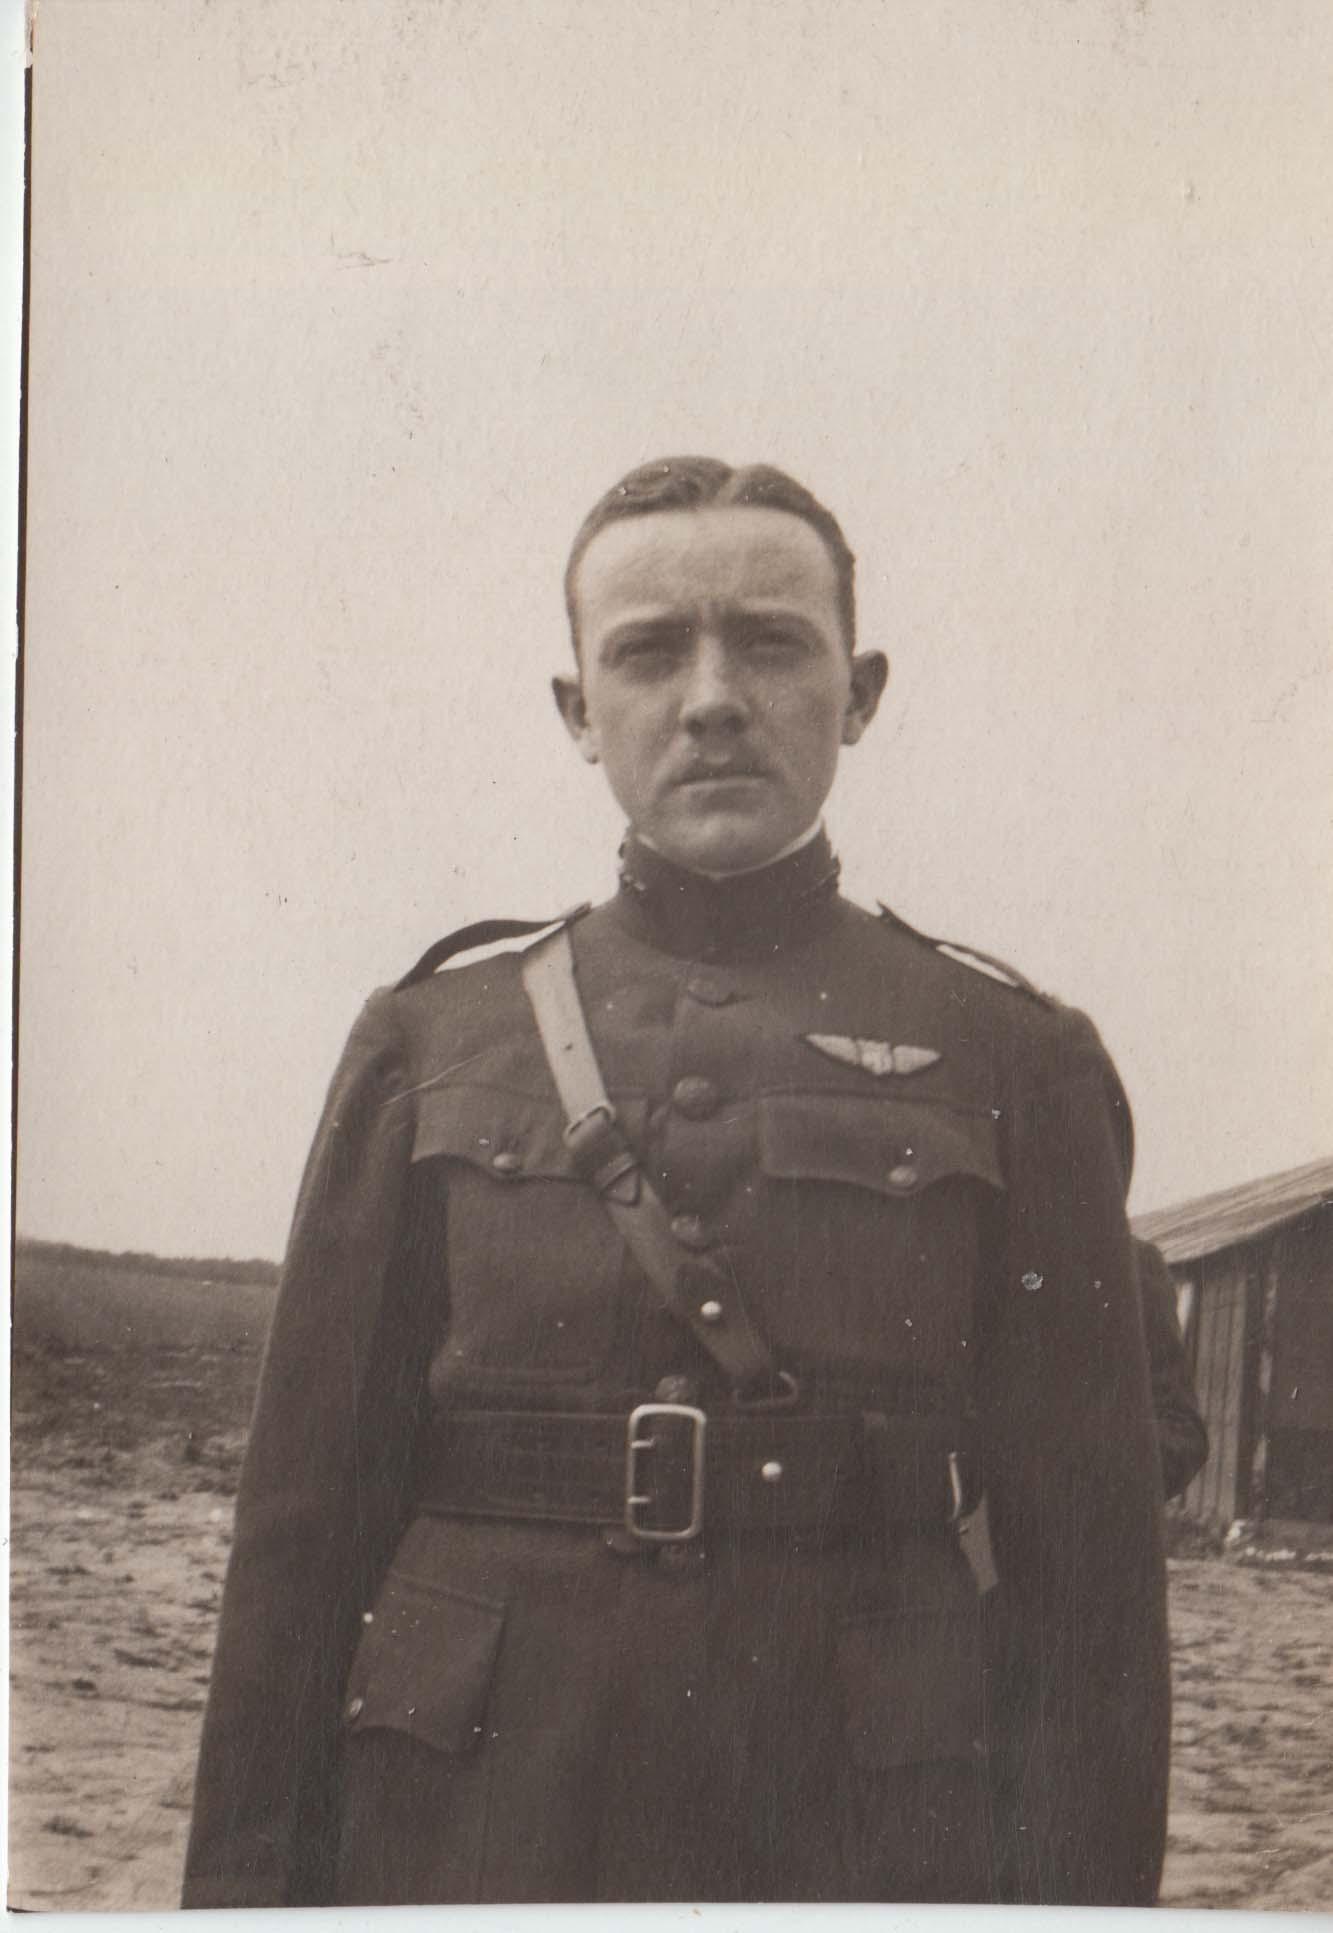 0441 Disgruntled Man in Uniform